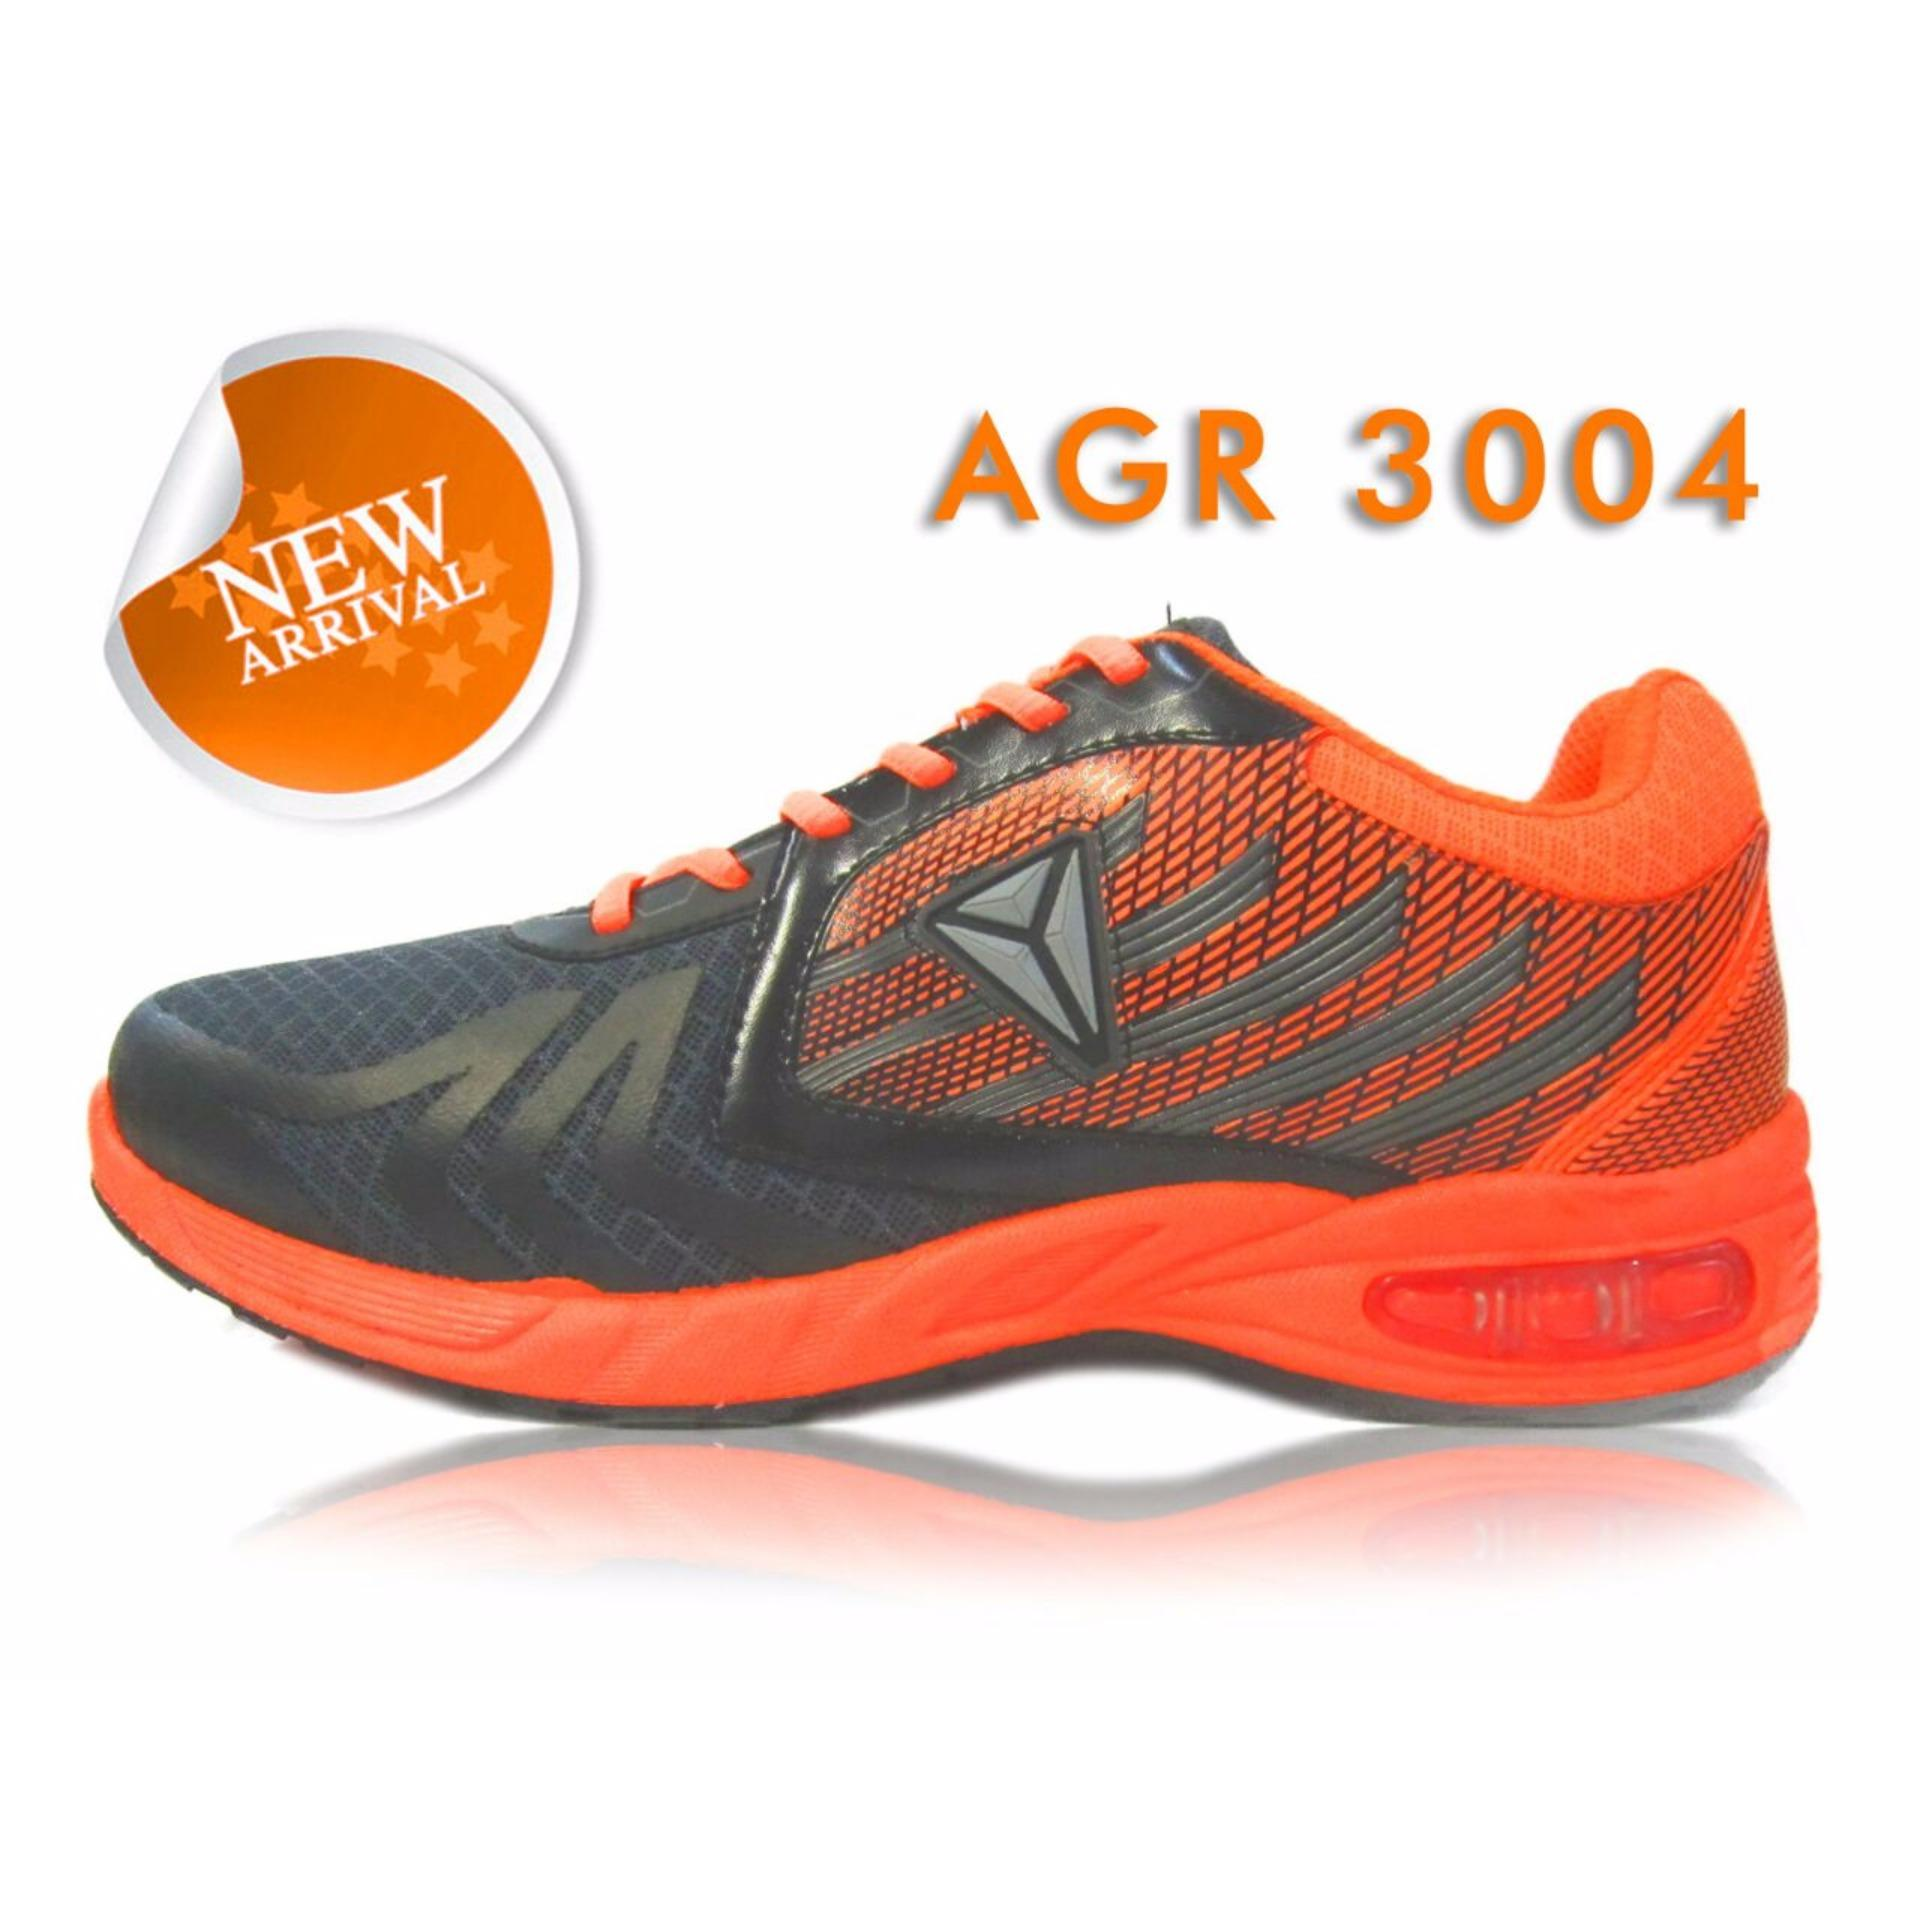 Beli Pro Att Agr 3004 Sepatu Olahraga Sepatu Lari Warna Abu Orange Pakai Kartu Kredit